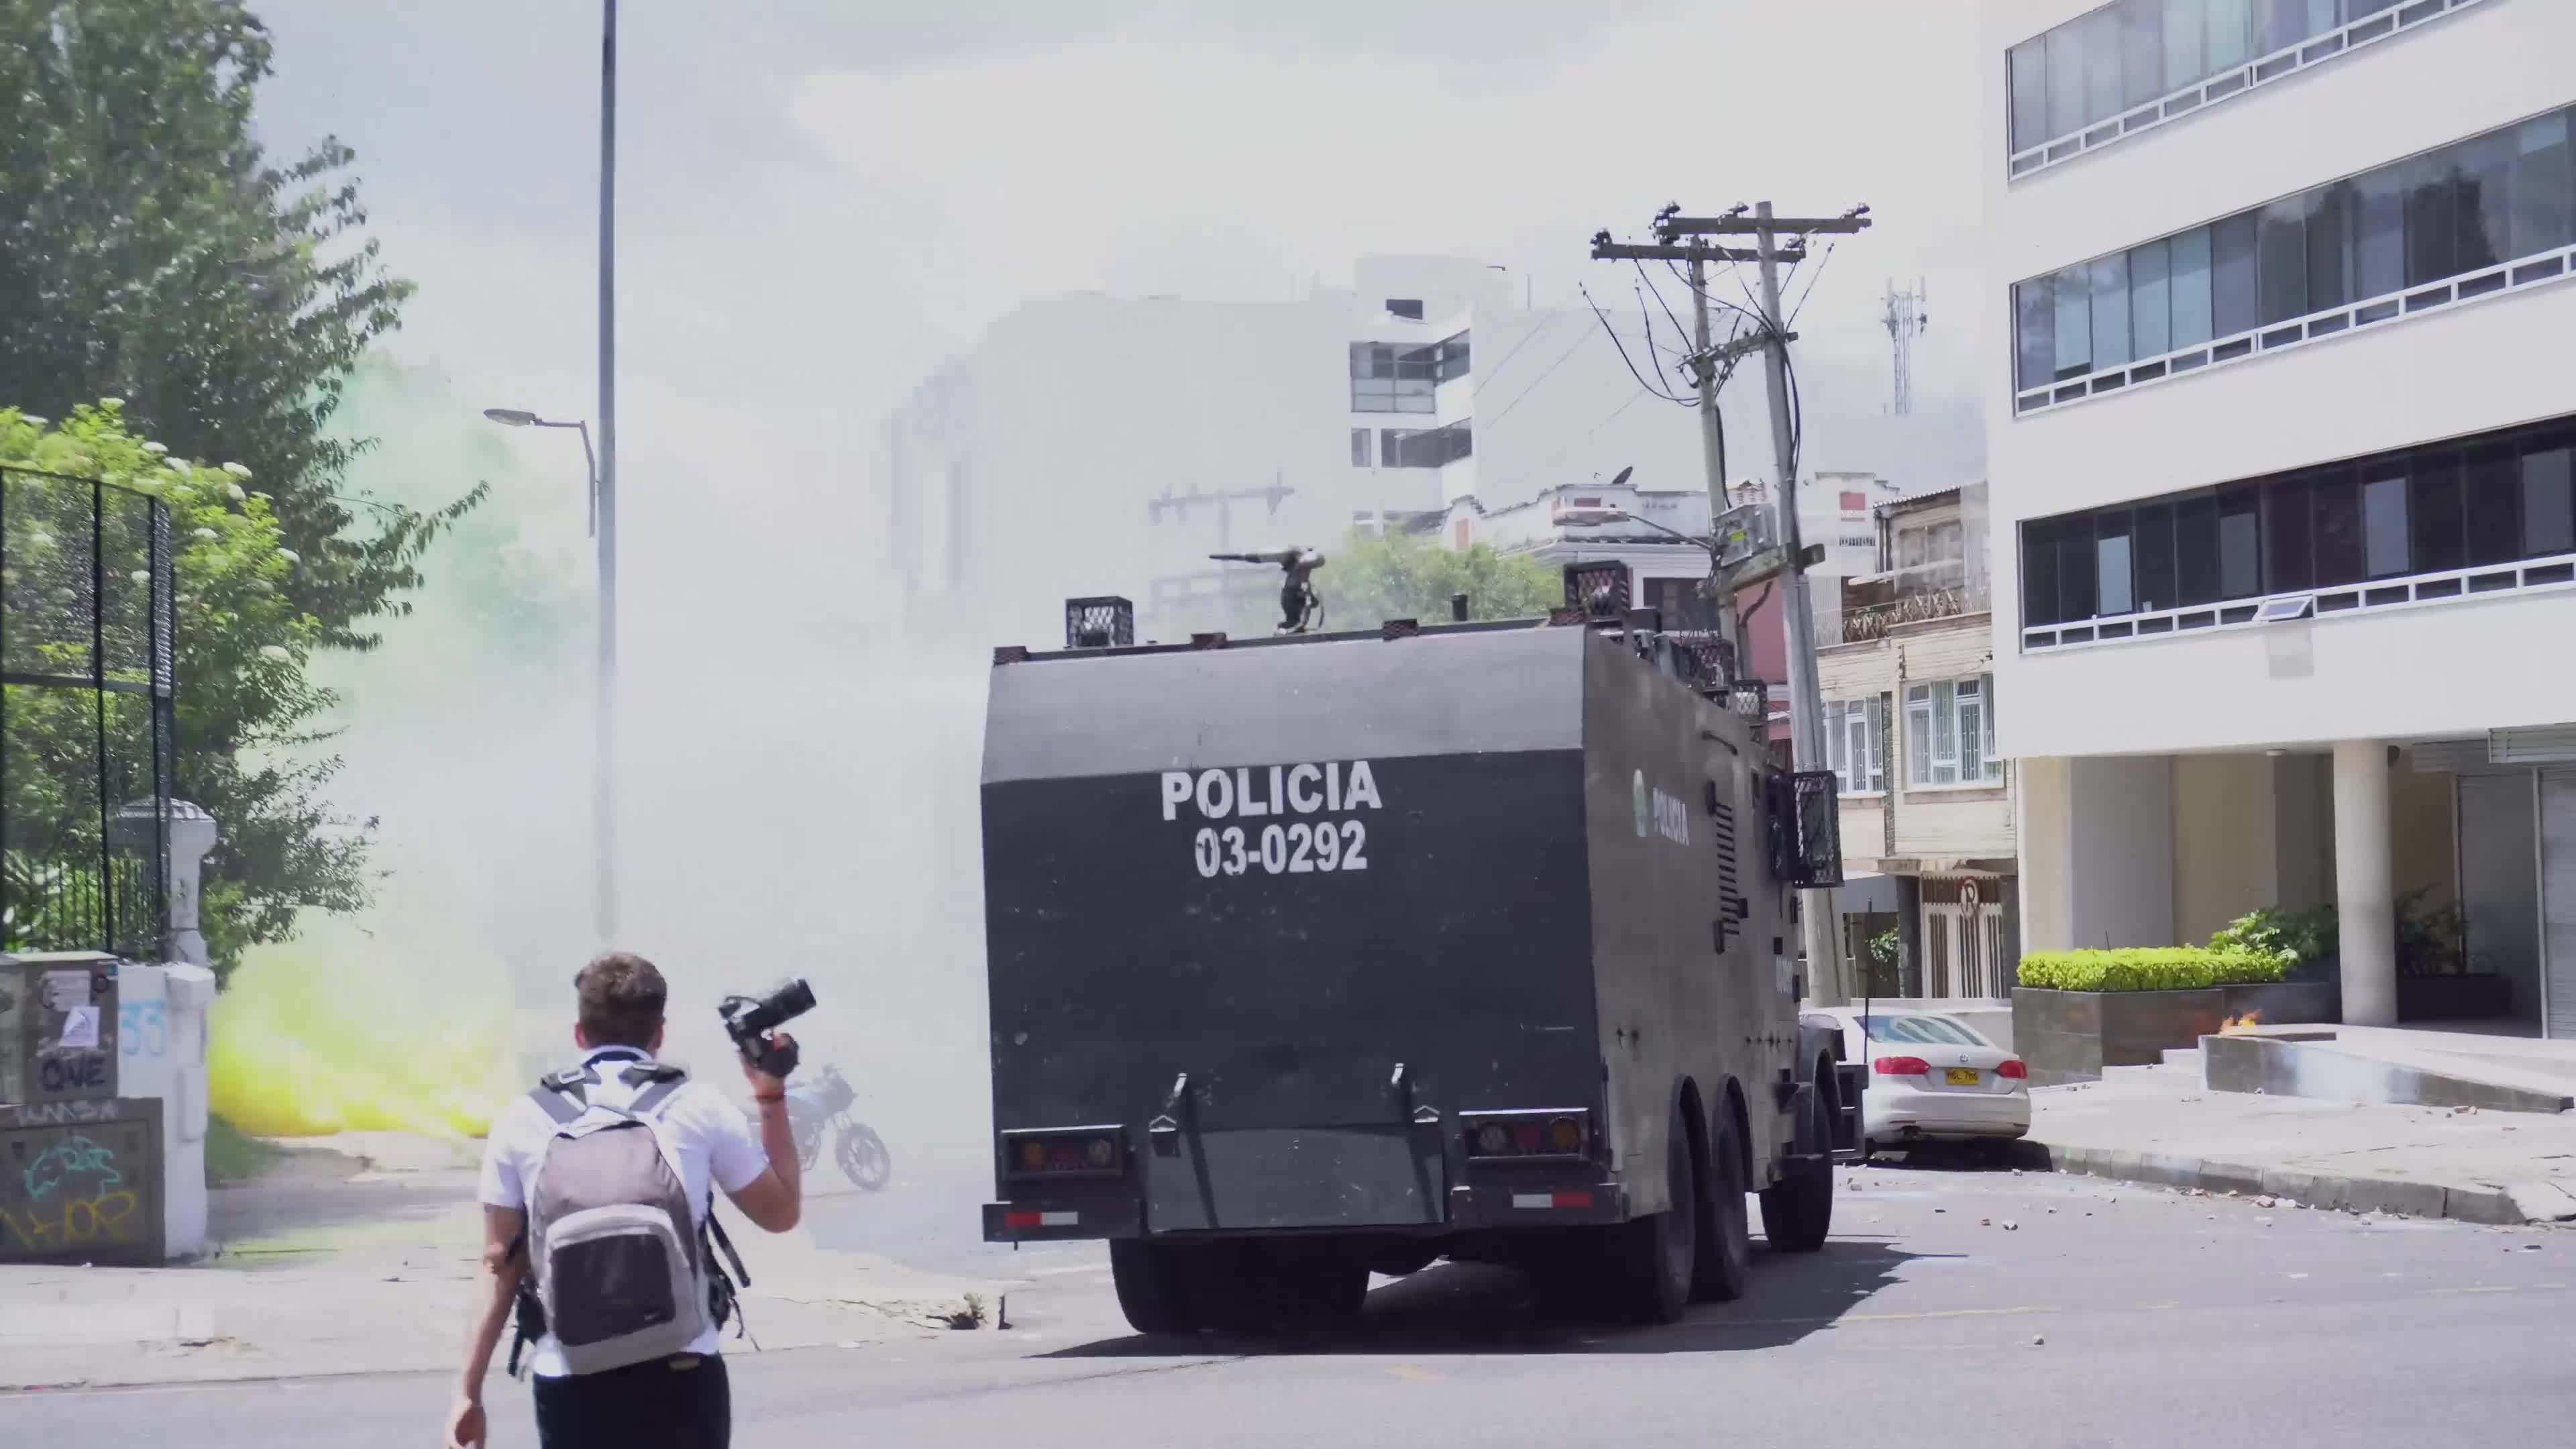 Riots in the University of Bogota